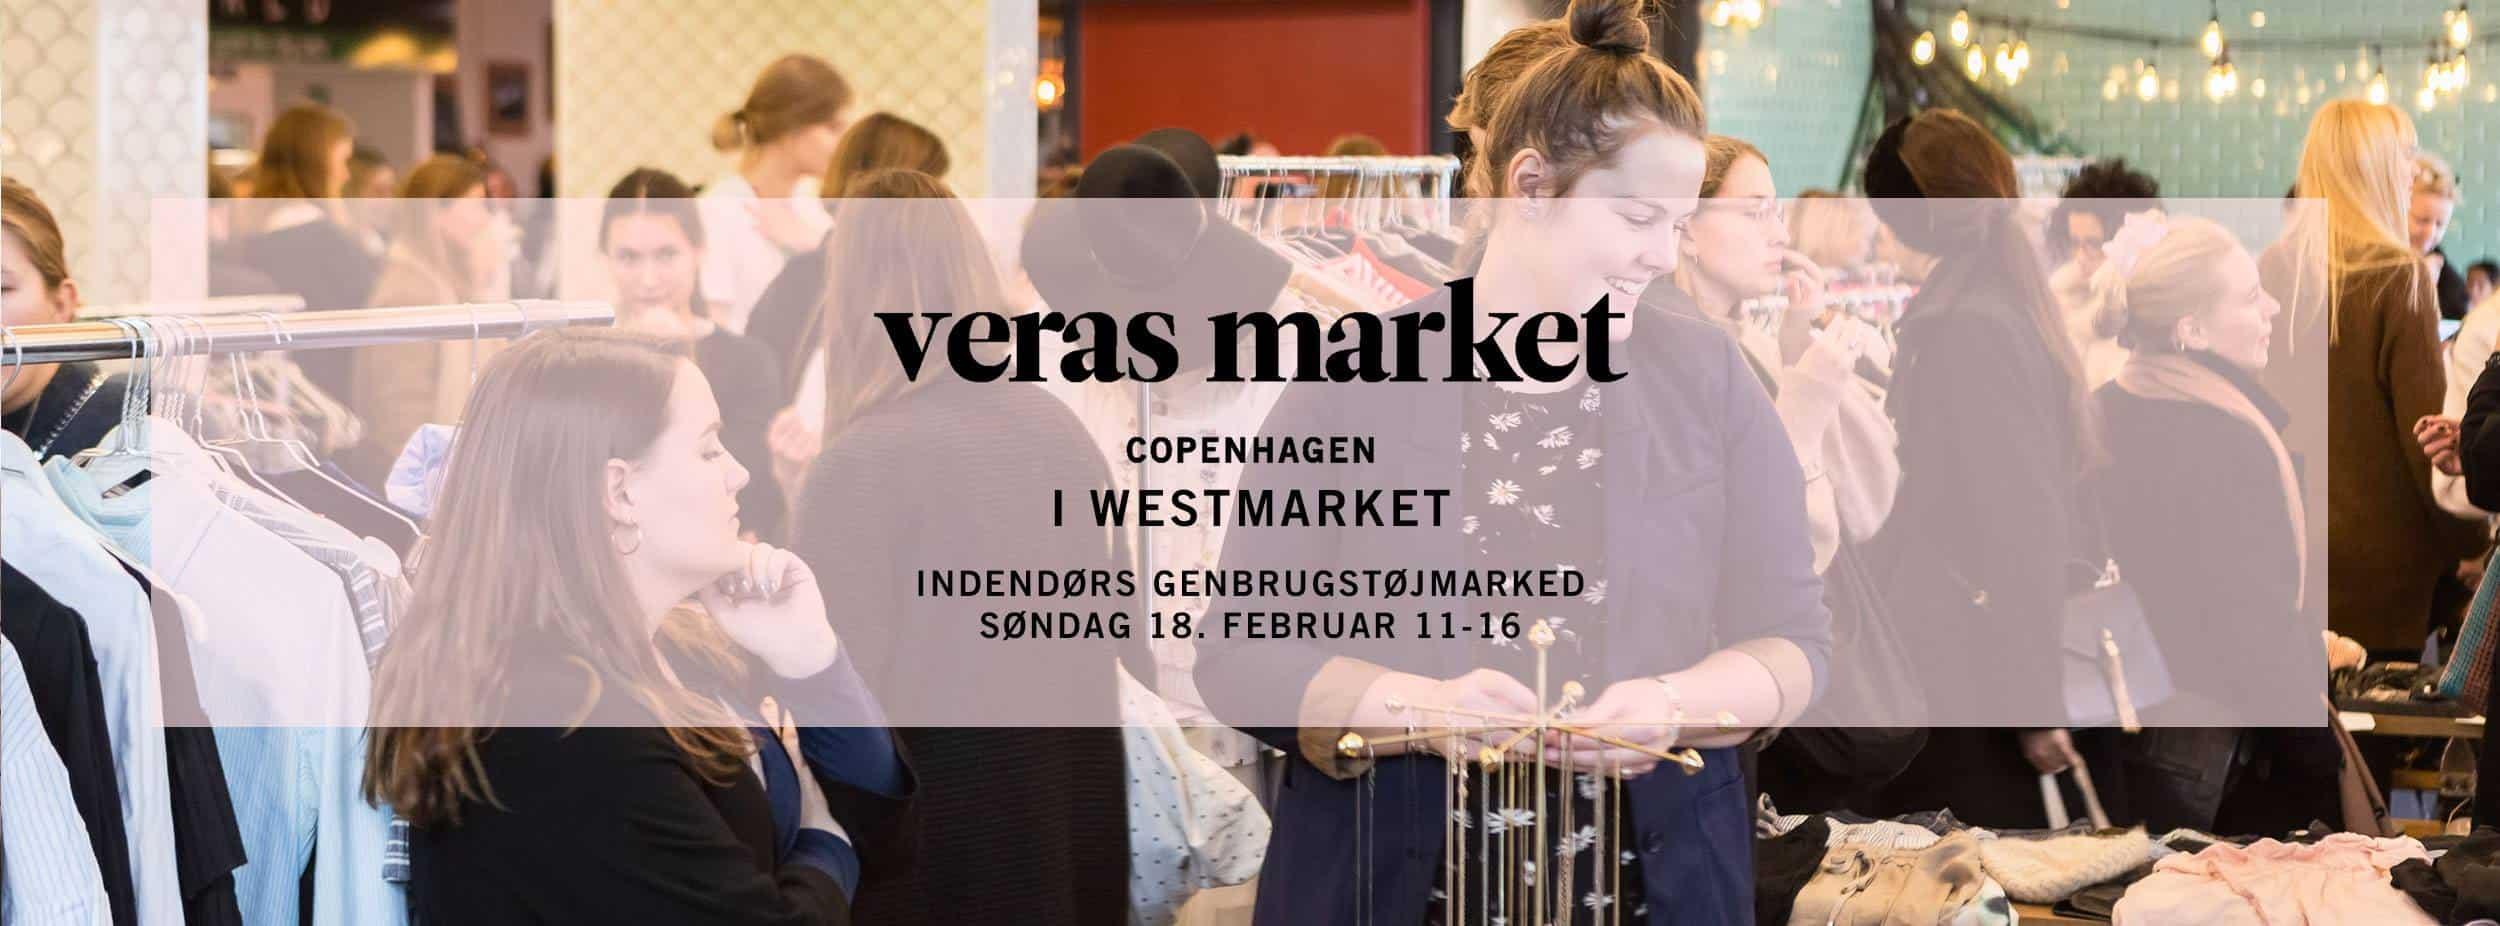 Fotocredit: Veras Market